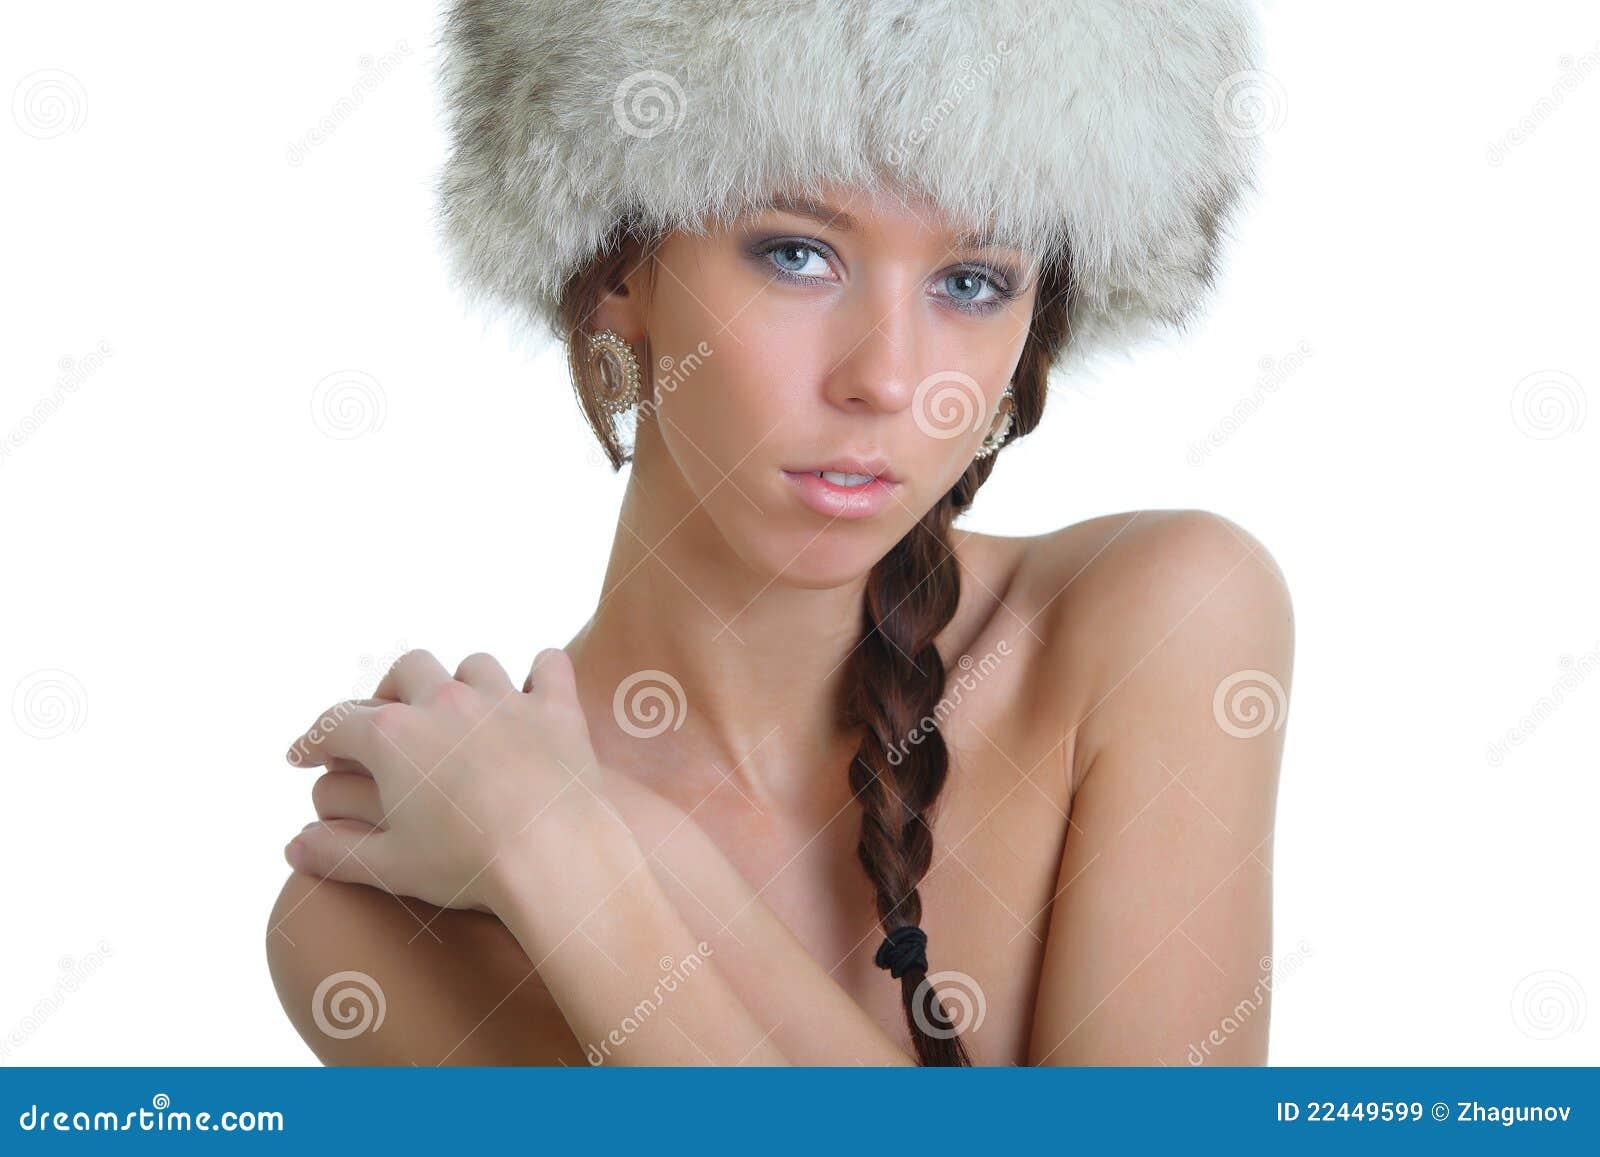 girls naked in fur